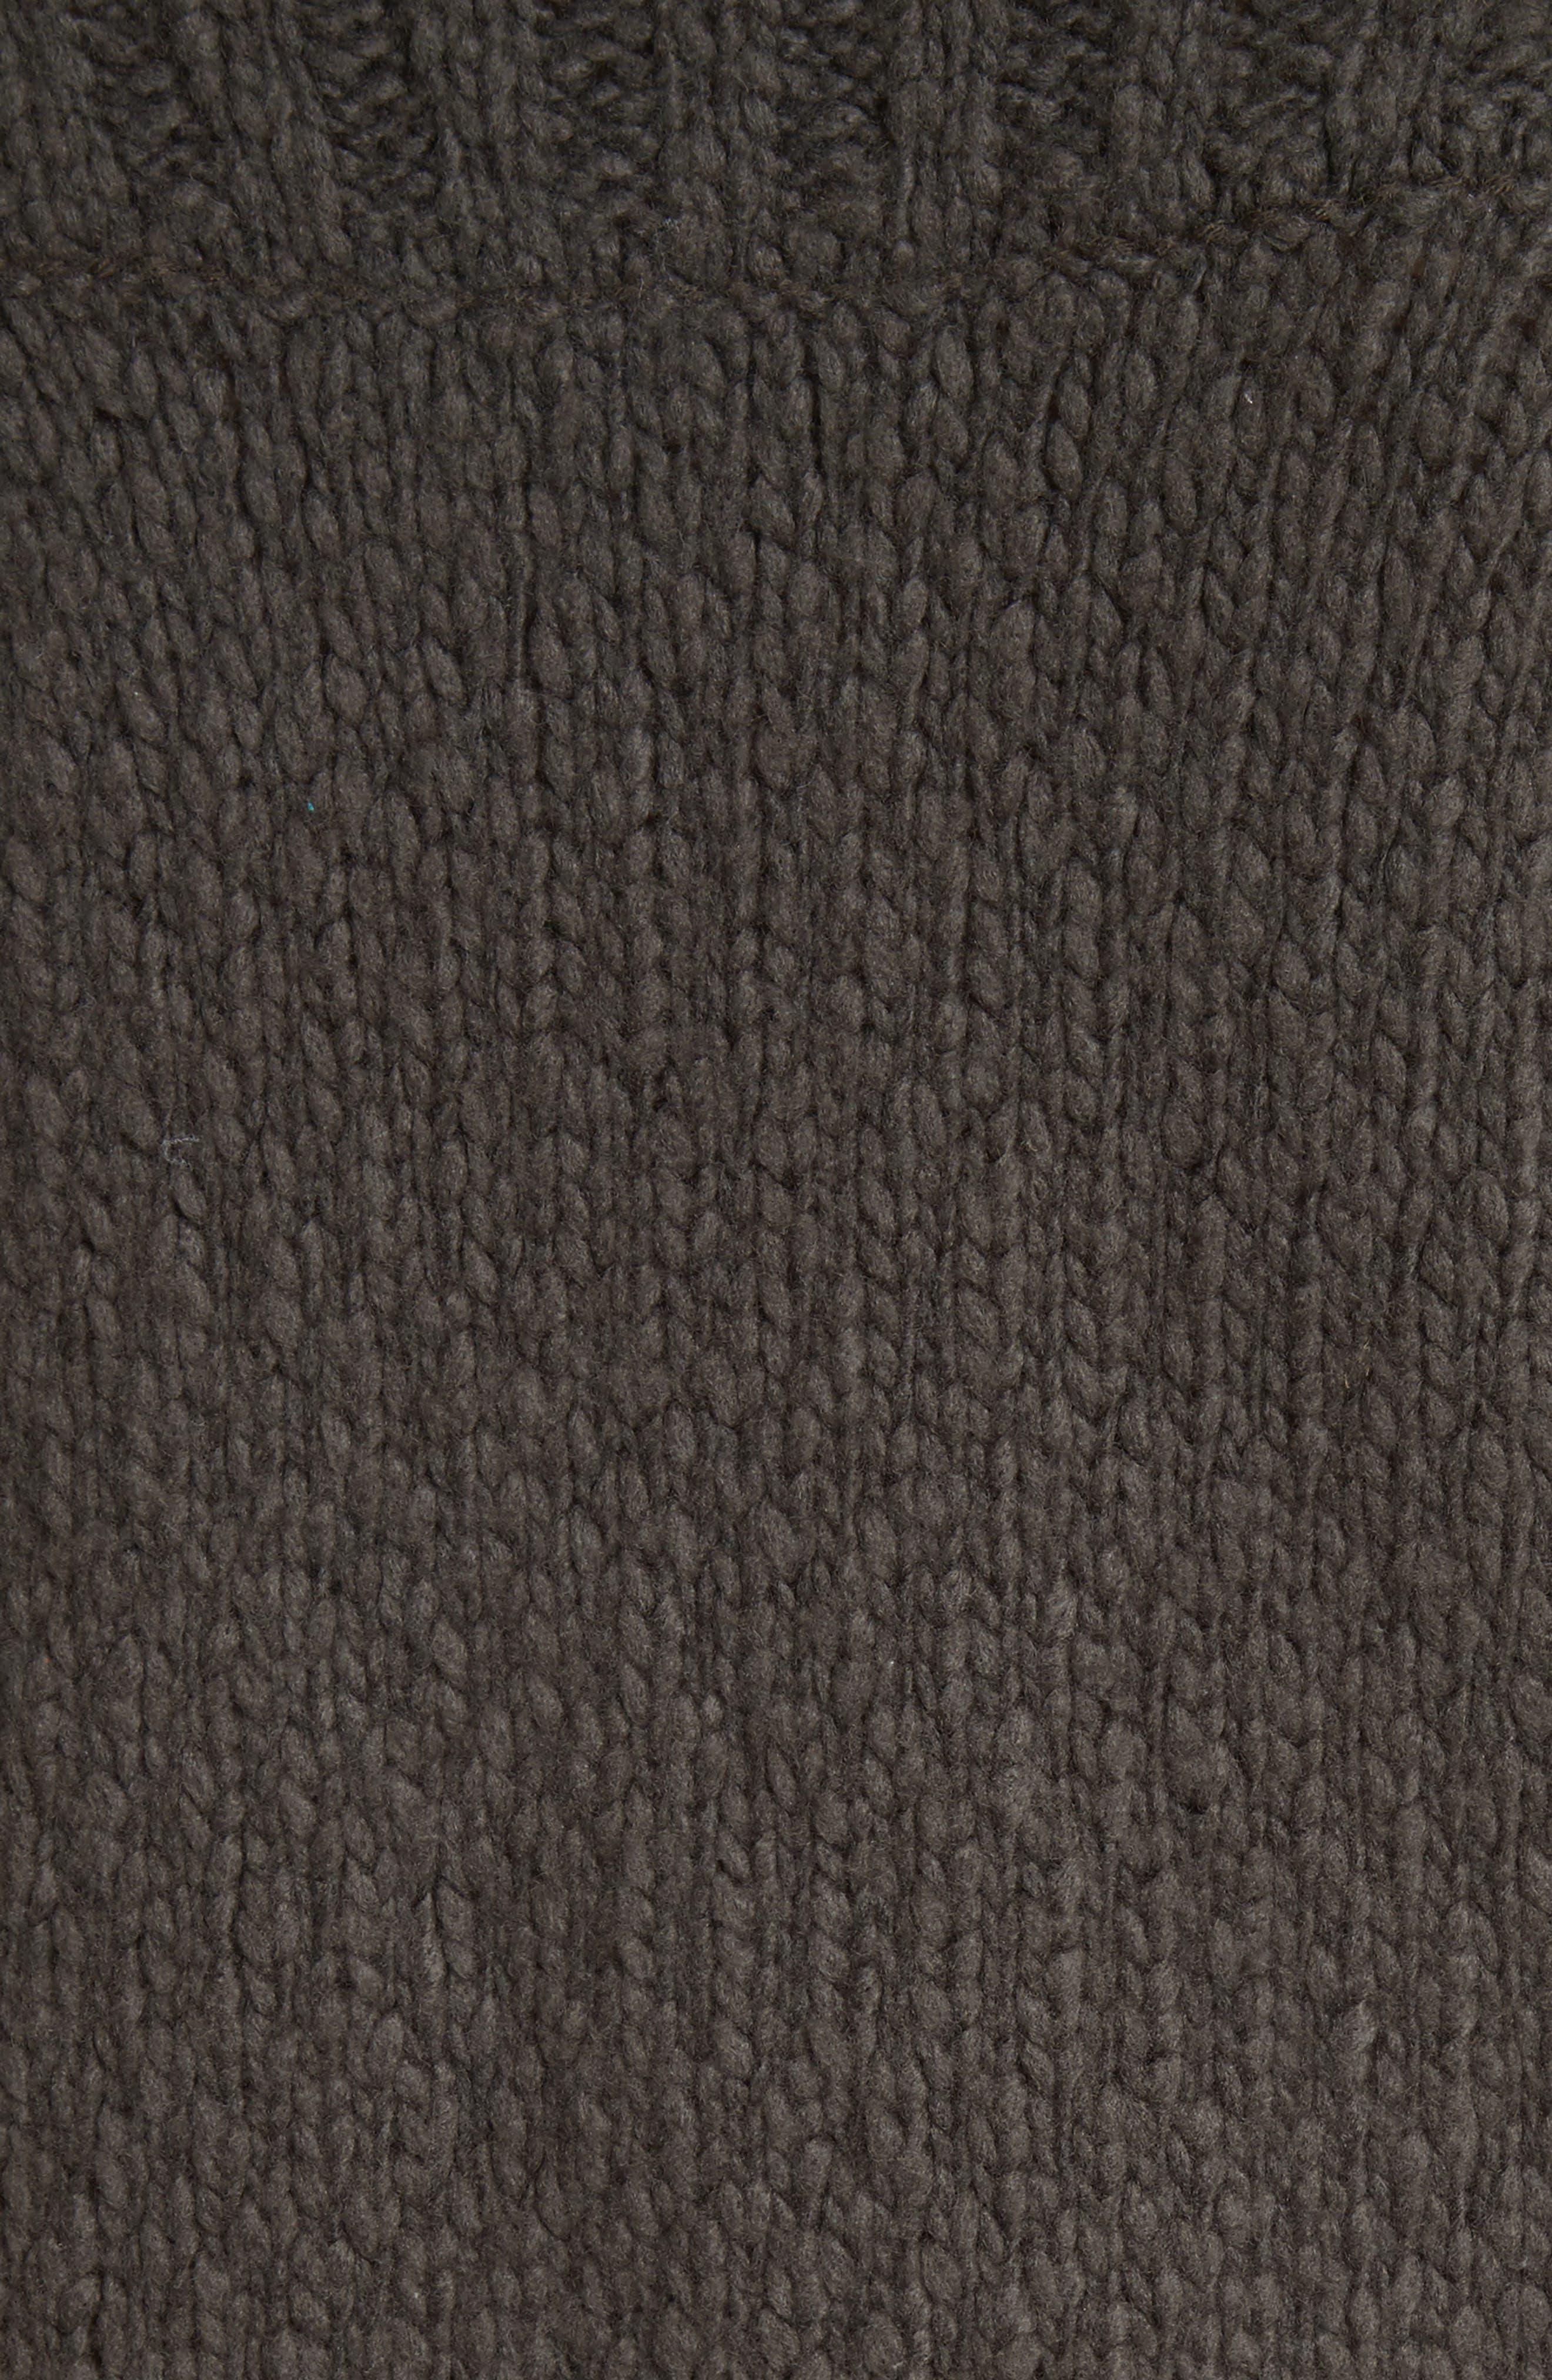 Ribbed Yoke Knit Sweater,                             Alternate thumbnail 5, color,                             Graphite